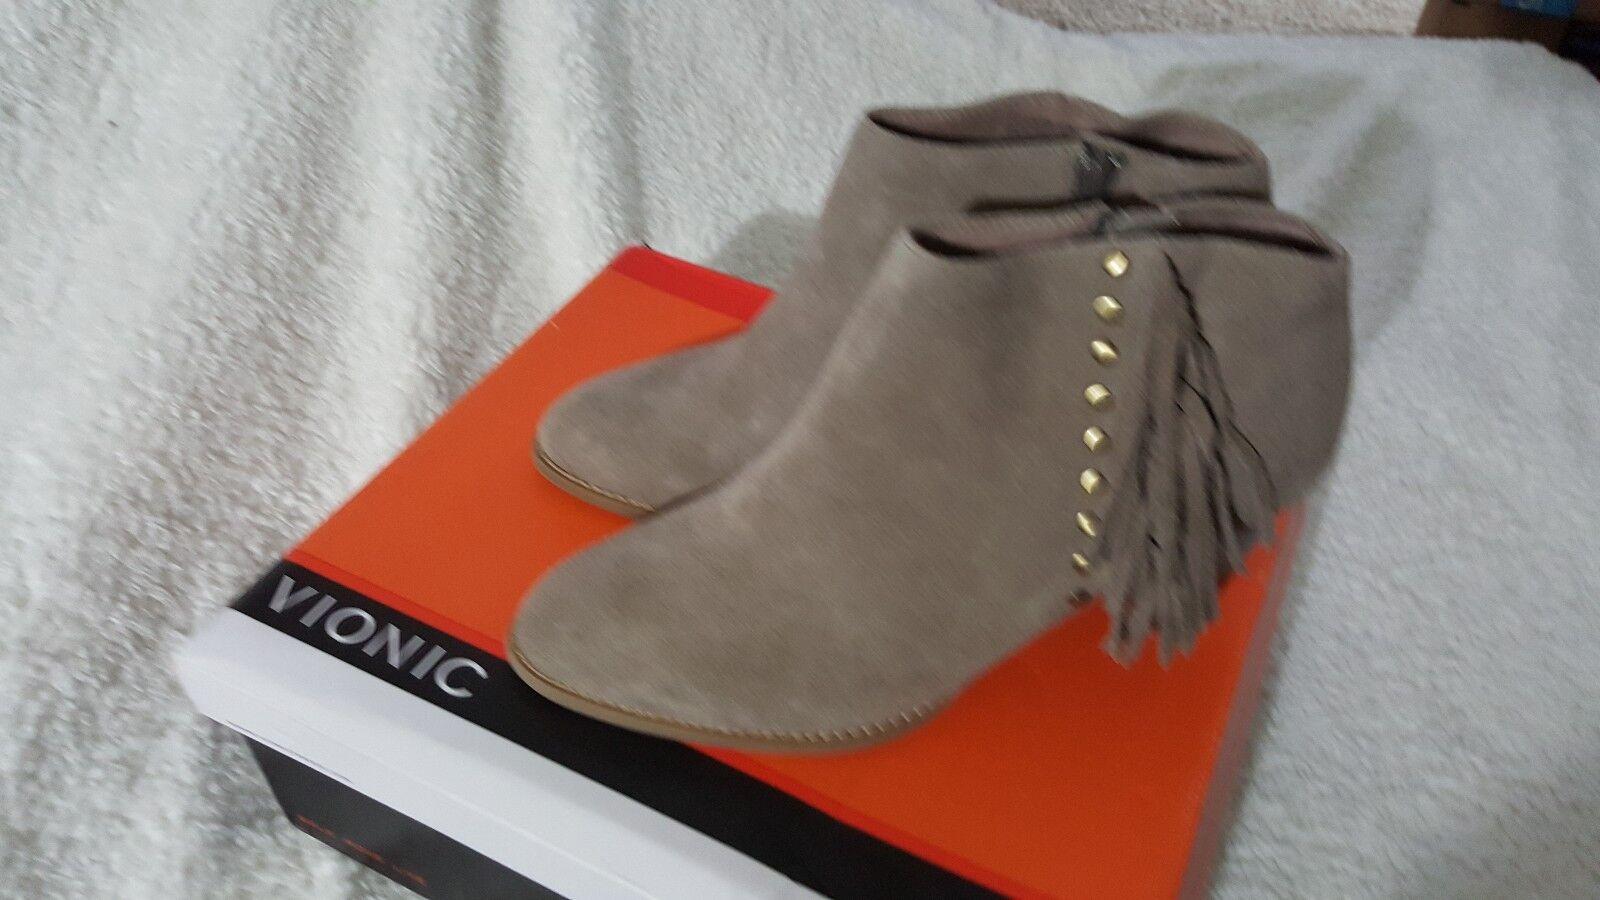 Vionic Tan Beige Suede Studs Fringe Fringe Fringe Ankle Boots - Faros Sz 9.5w Ret  159 CUTE 65529b